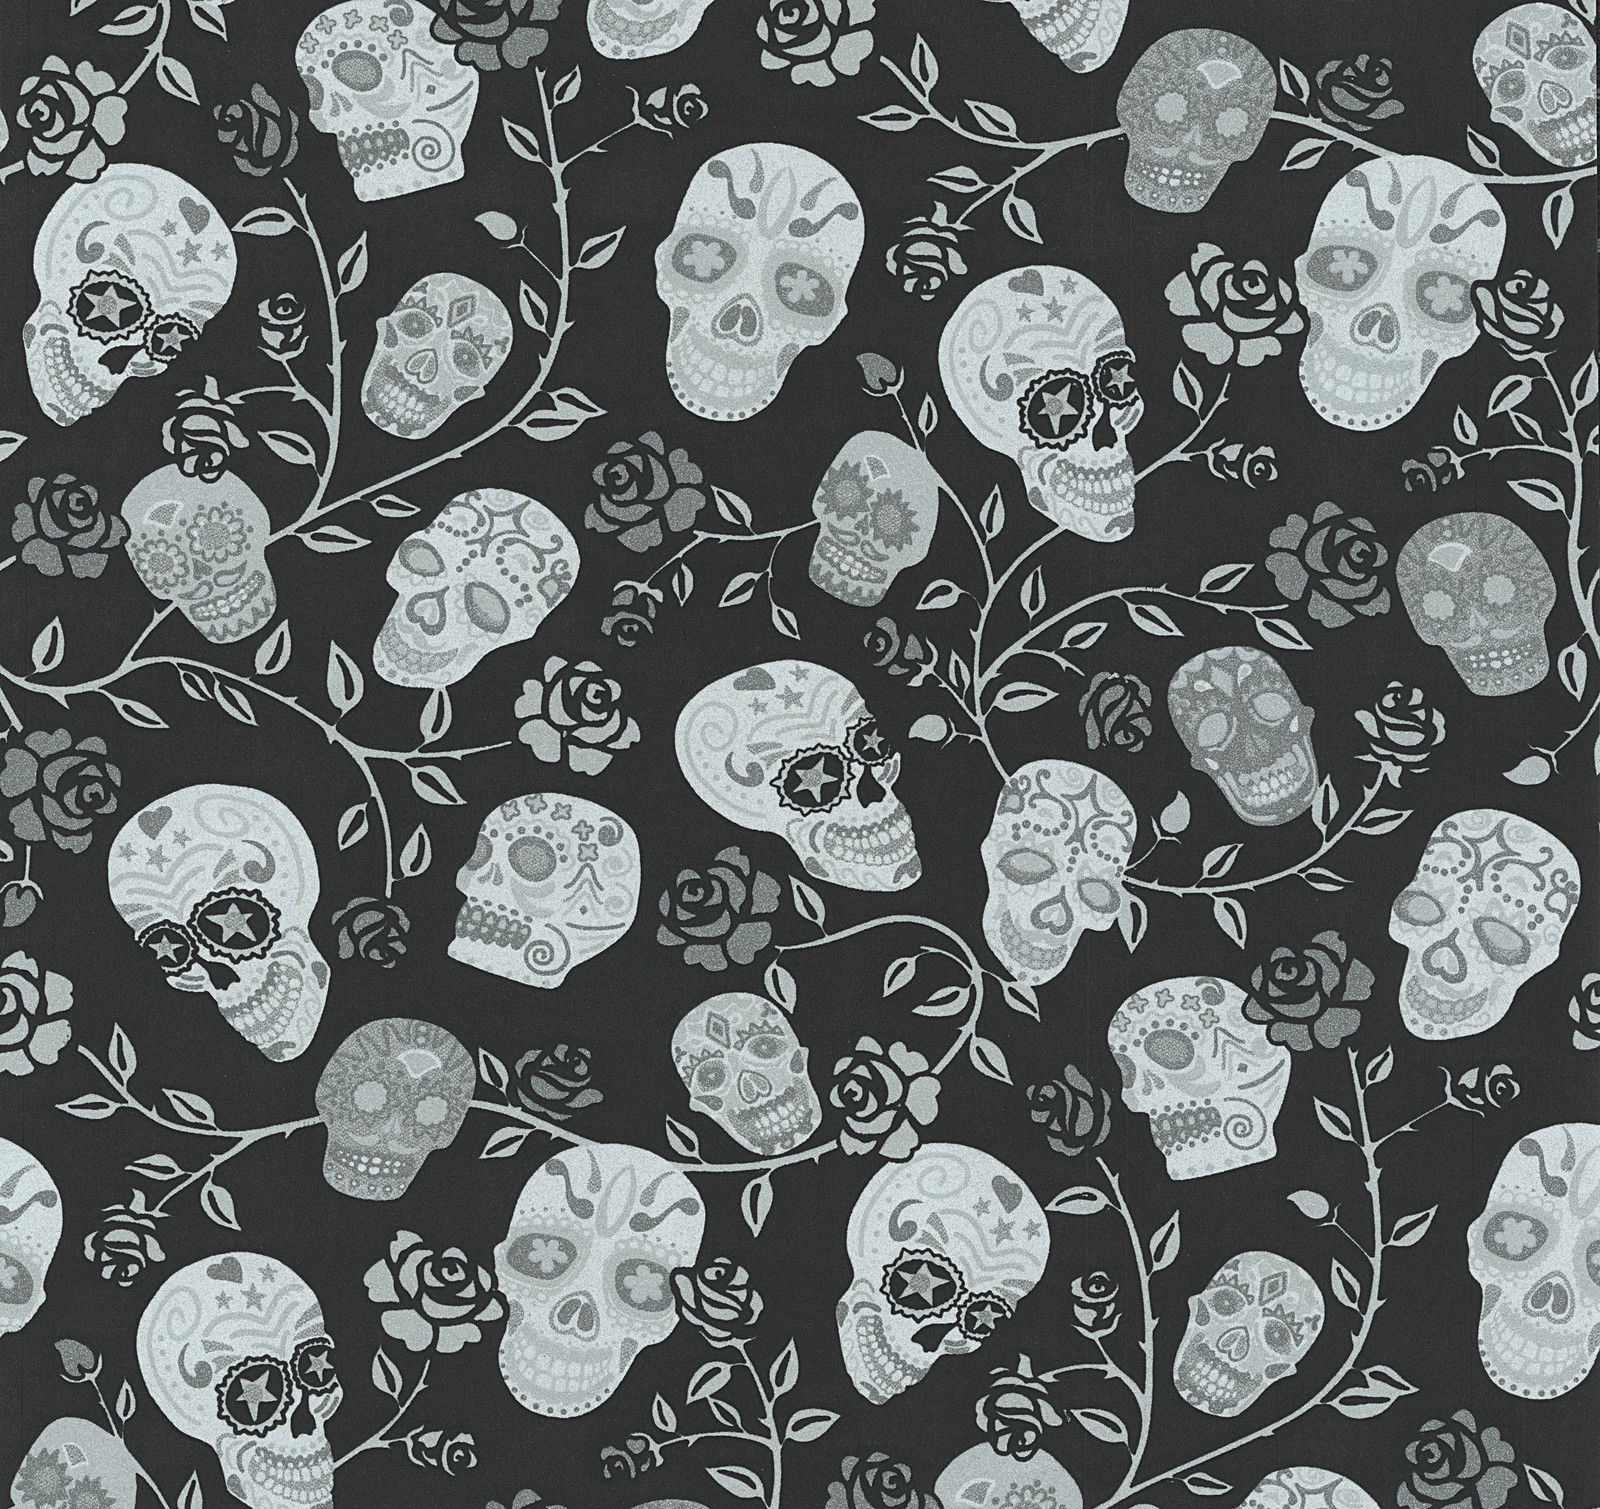 Skulls Wallpaper Black Silver Grey Floral Flowers Stars Glitter